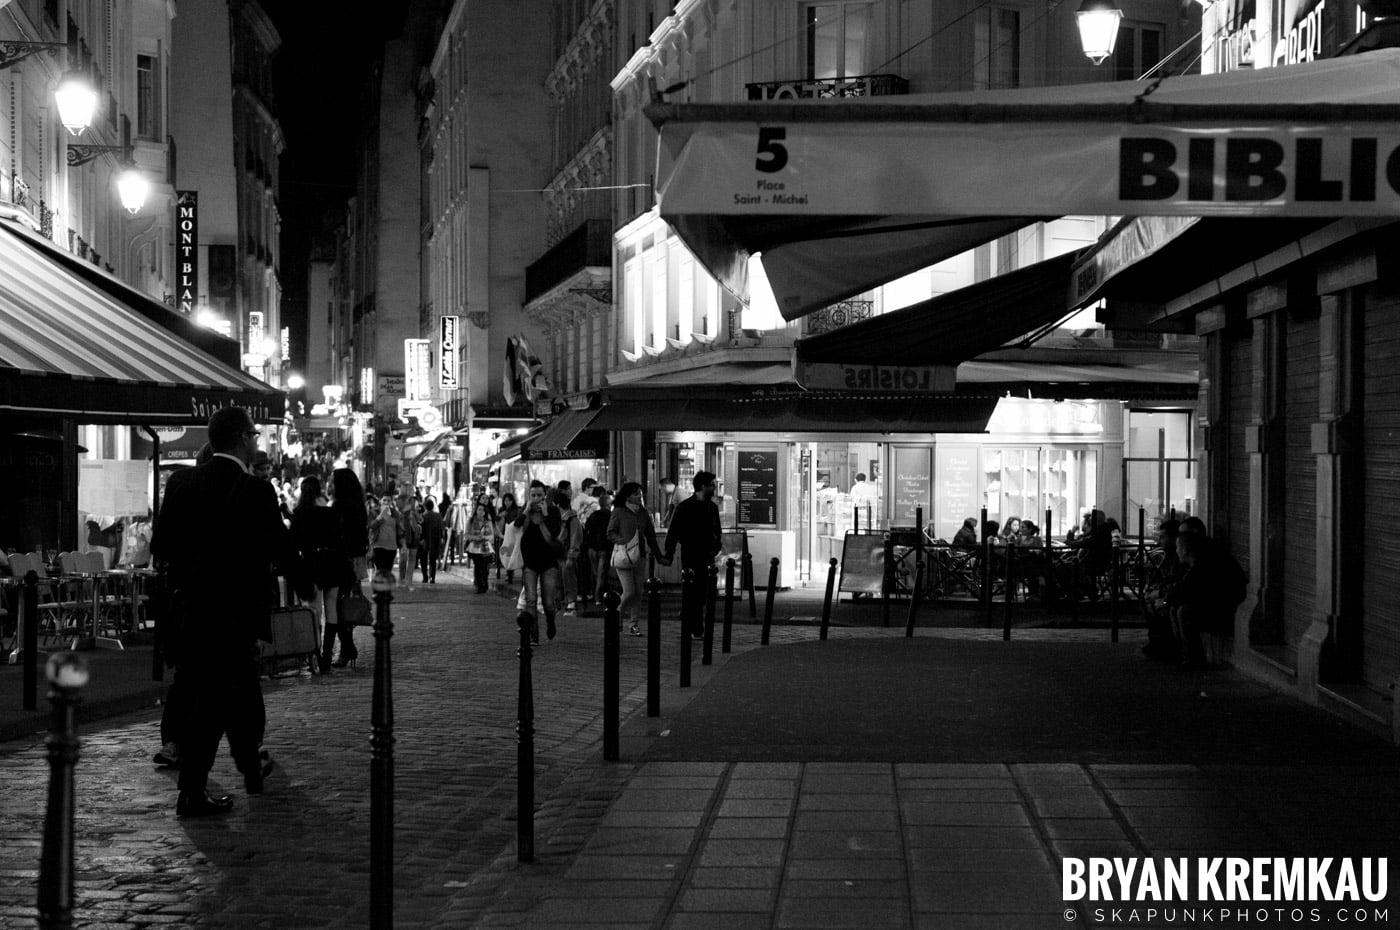 Paris, France Honeymoon - Day 4 - 7.21.11 (65)